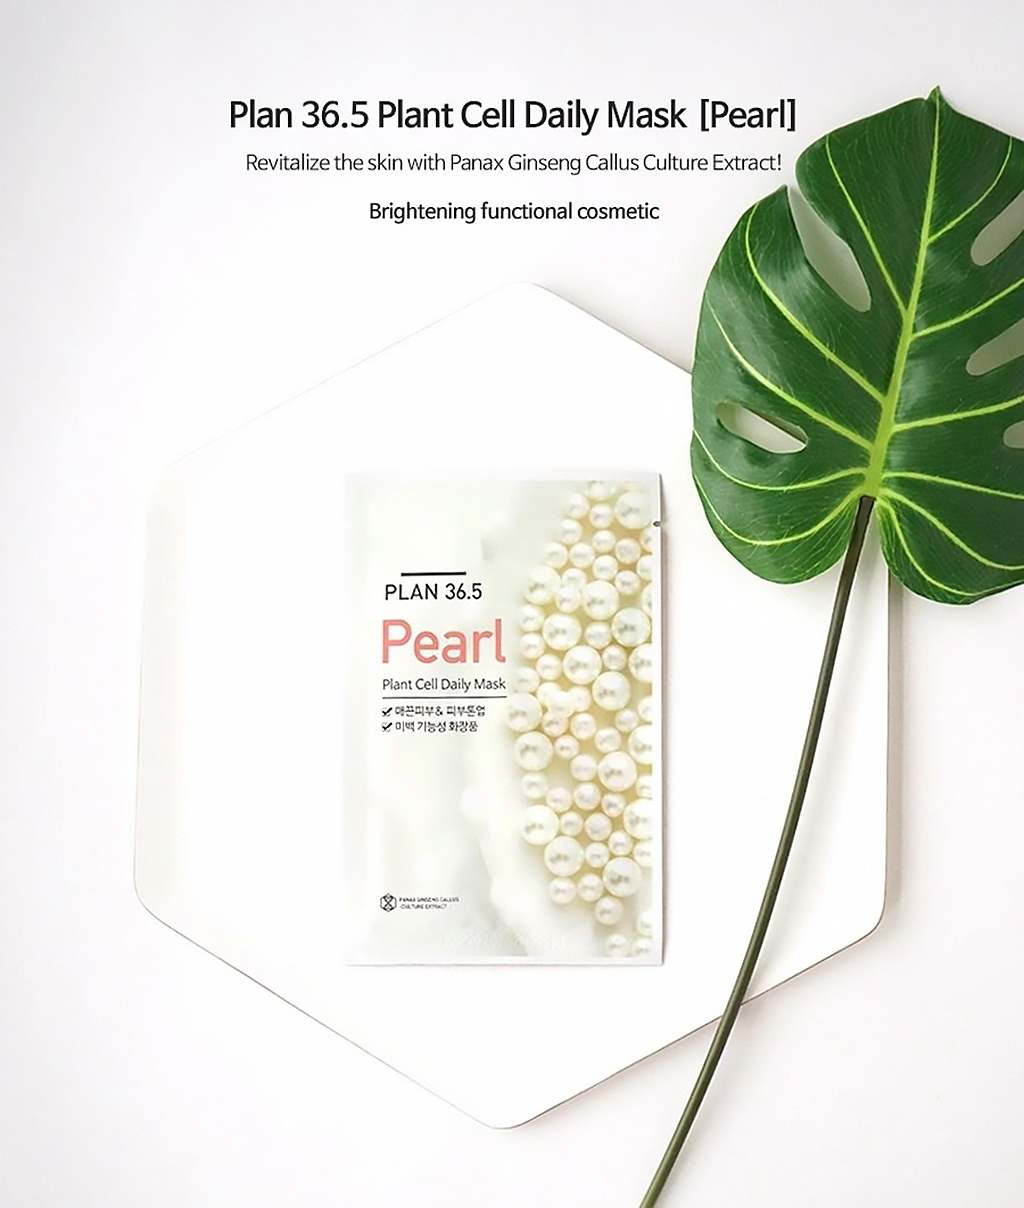 plan365-dailymask-pearl-description-1.jpg